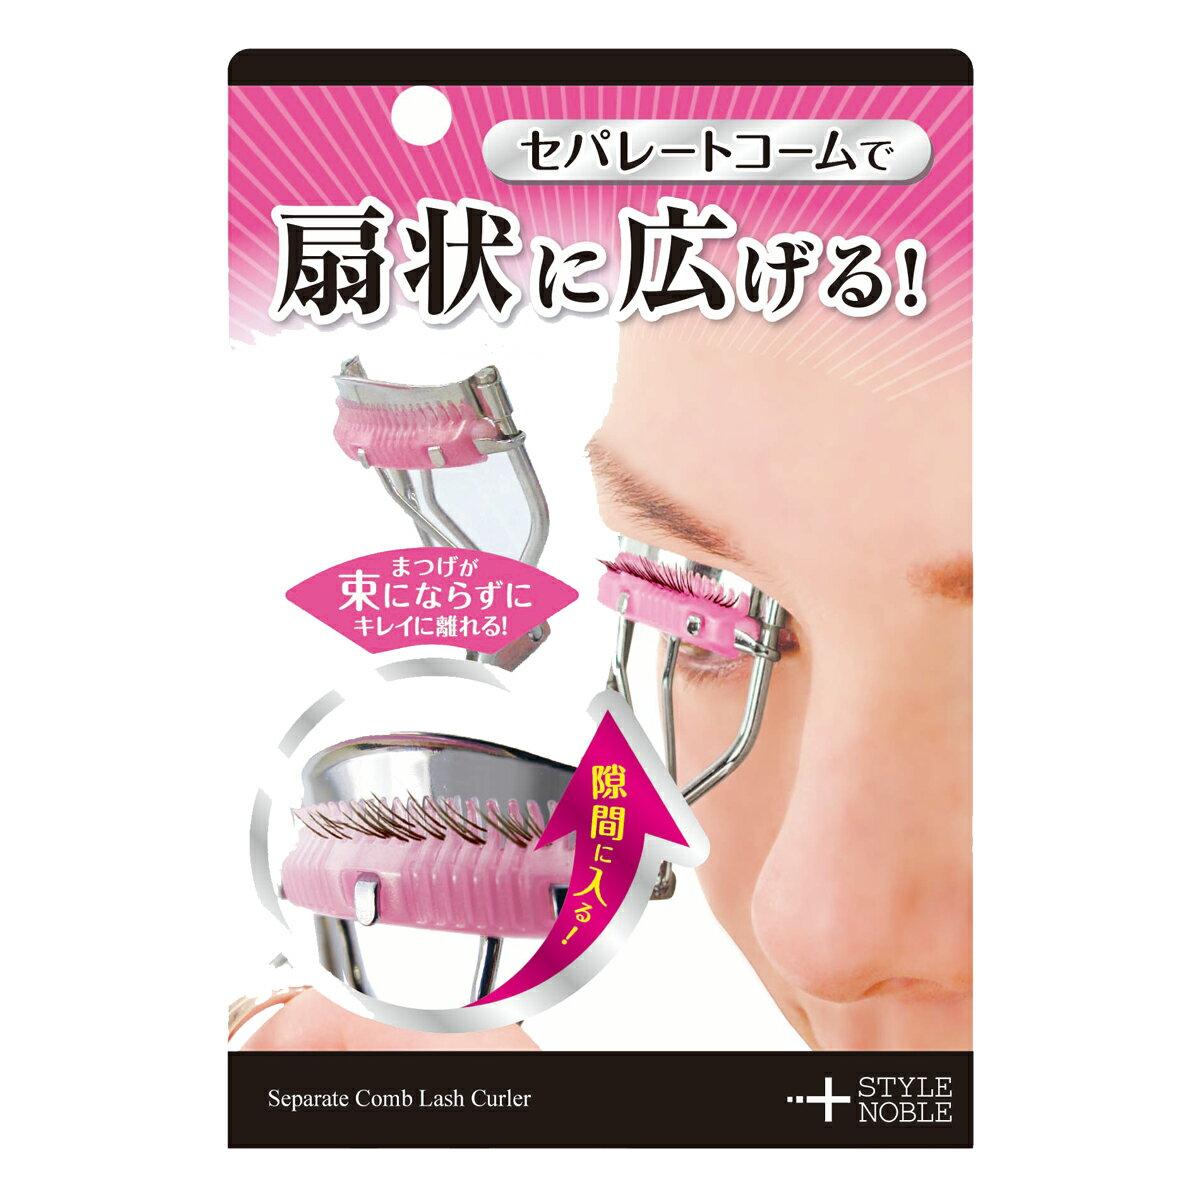 NOBLE 扇形超廣角睫毛夾 1入 - 限時優惠好康折扣